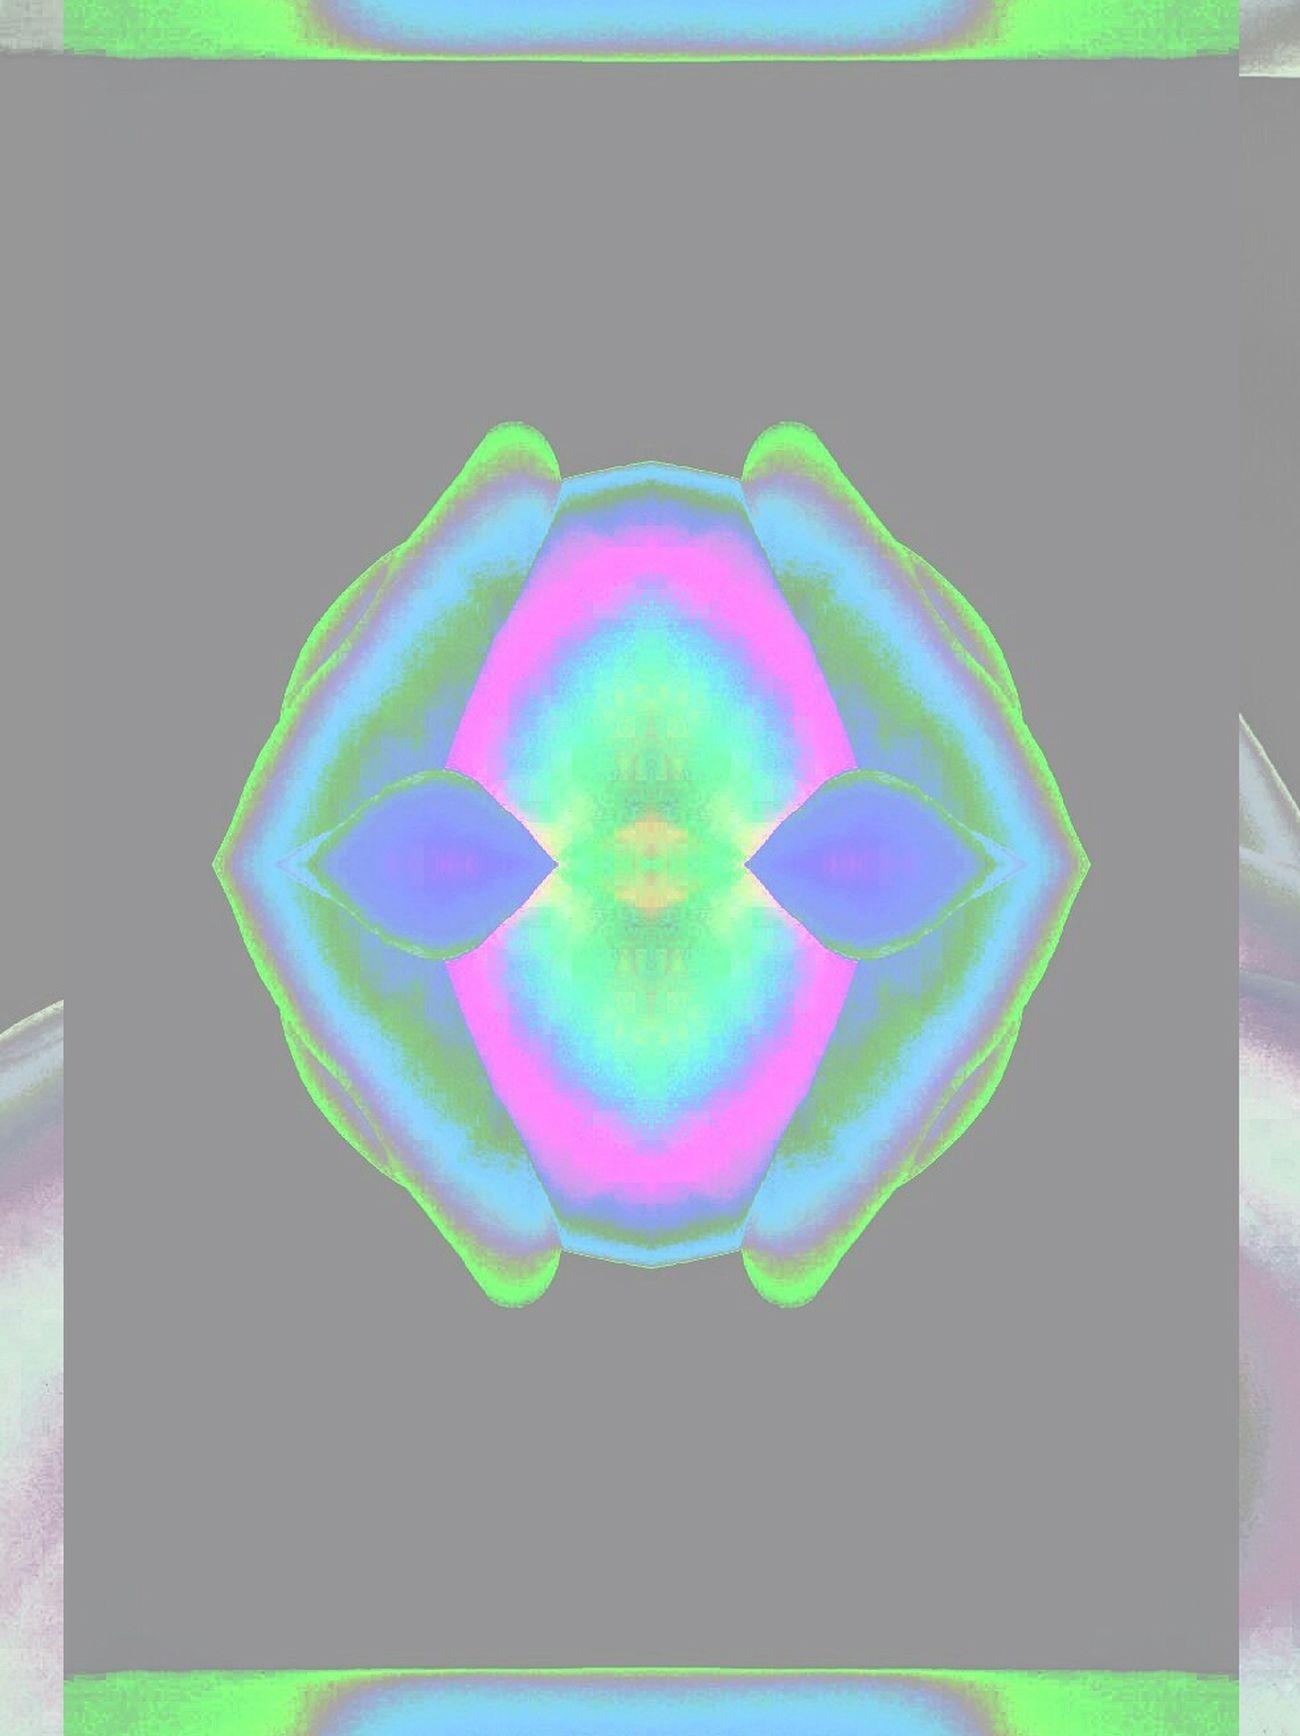 Glitch Digital Art Experimental Art Neons Light Colorful Mysterious Beauty Pure POTD Original Bright